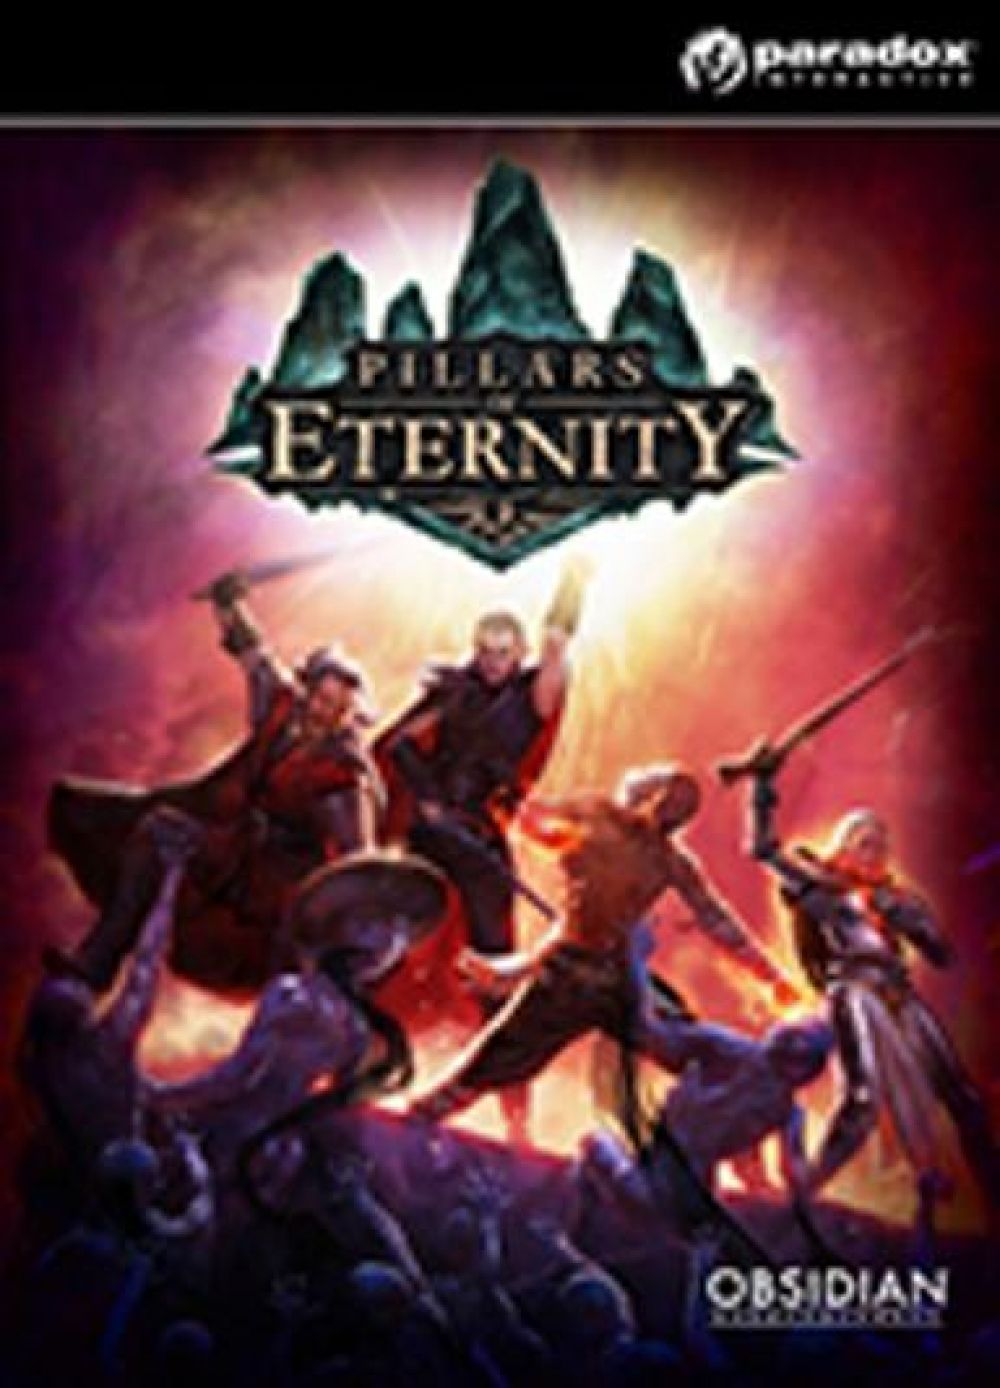 Pillars of Eternity (Hero Edition) Price 10.49 & Instant